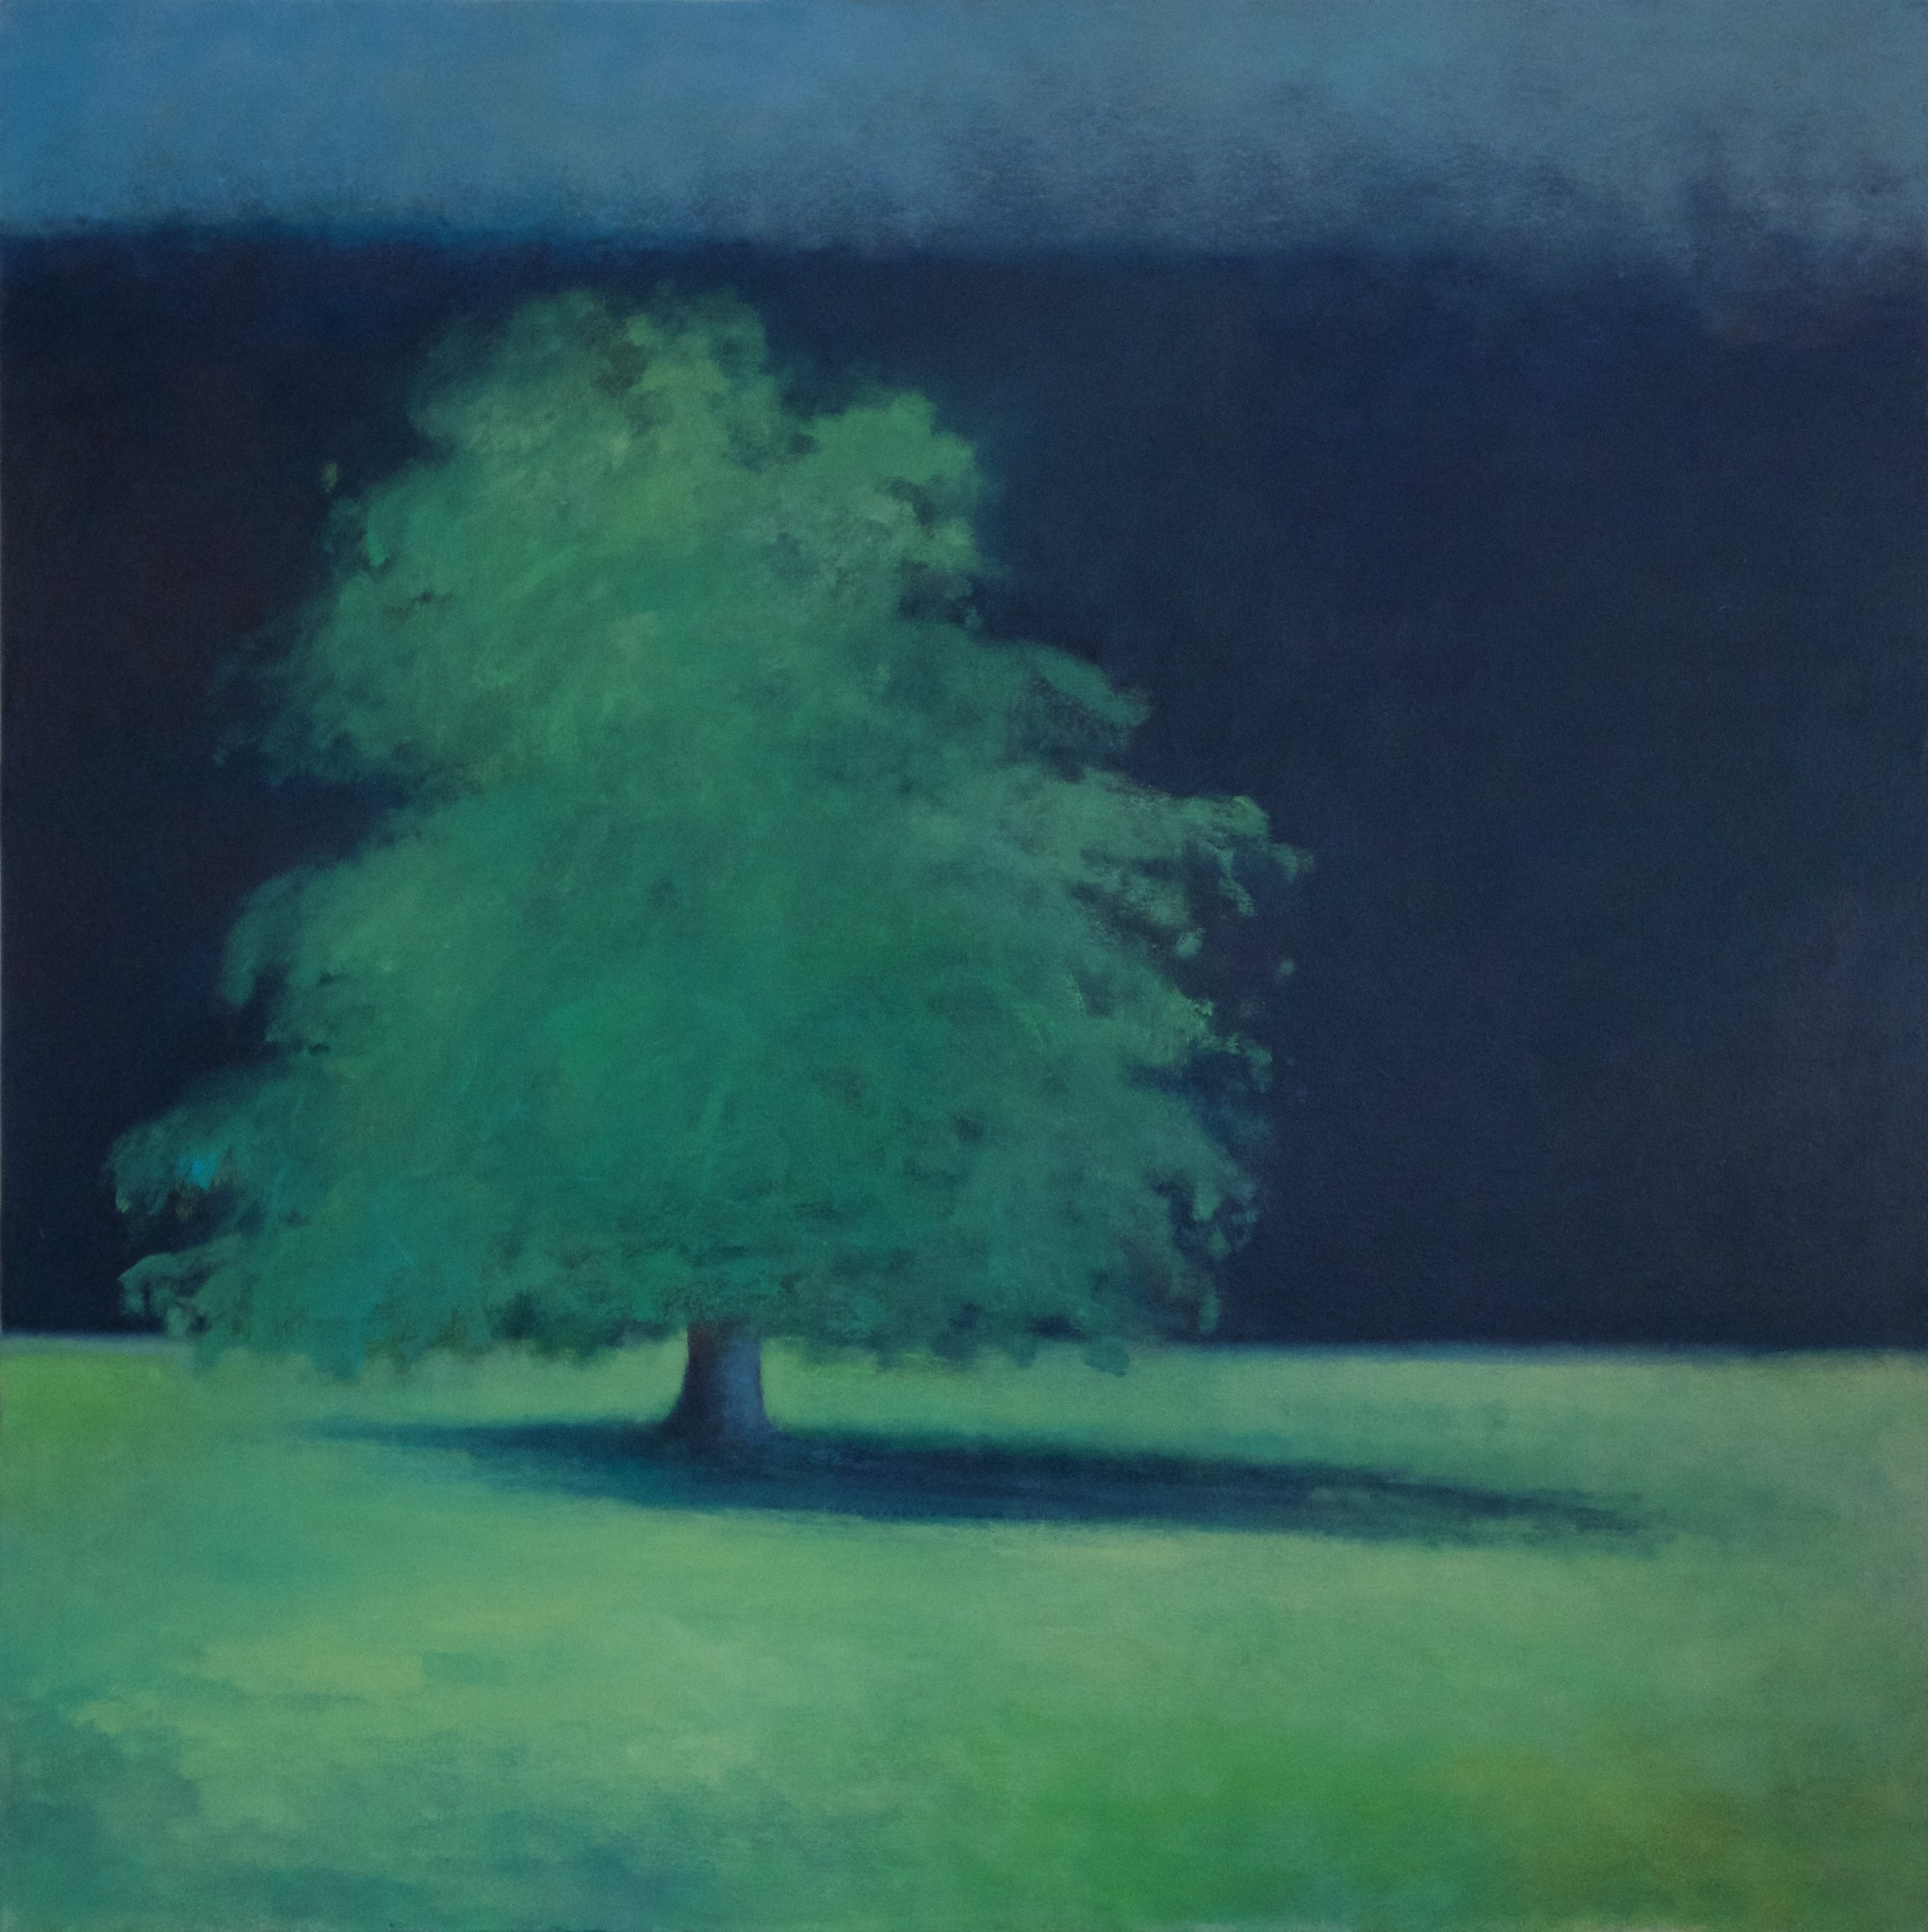 Artist: Claire Beattie  Title: Summer Colour  Size: 102 x 102 cm  Medium: Oil on canvas  Price: £2650